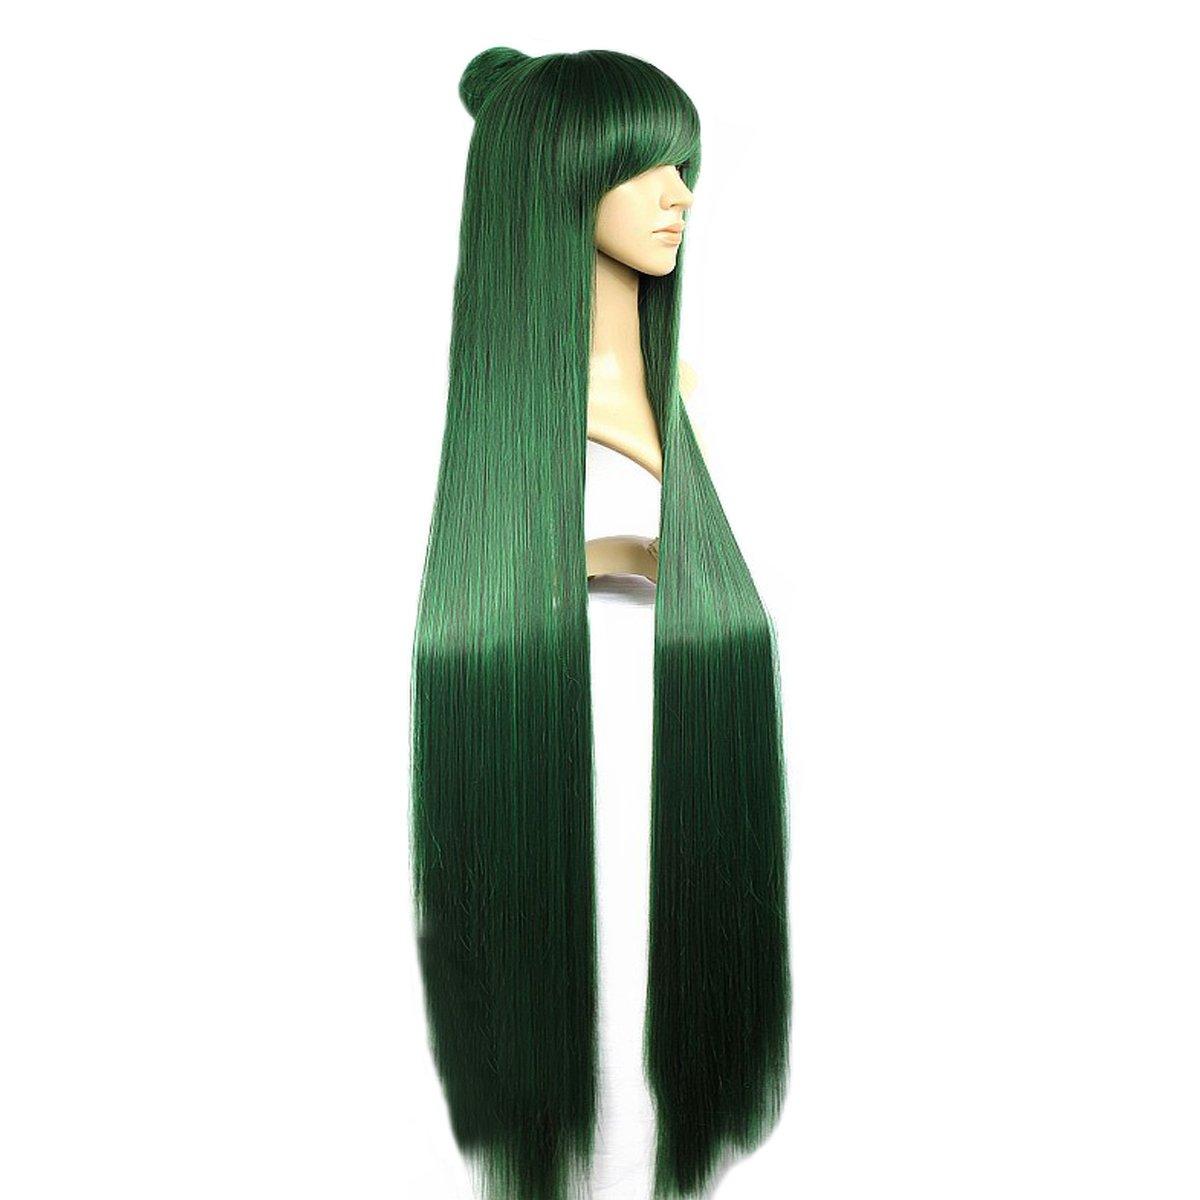 Angelaicos Women's Fiber Max 53% OFF Straight Cosplay Long Popular popular Party Wig Costume